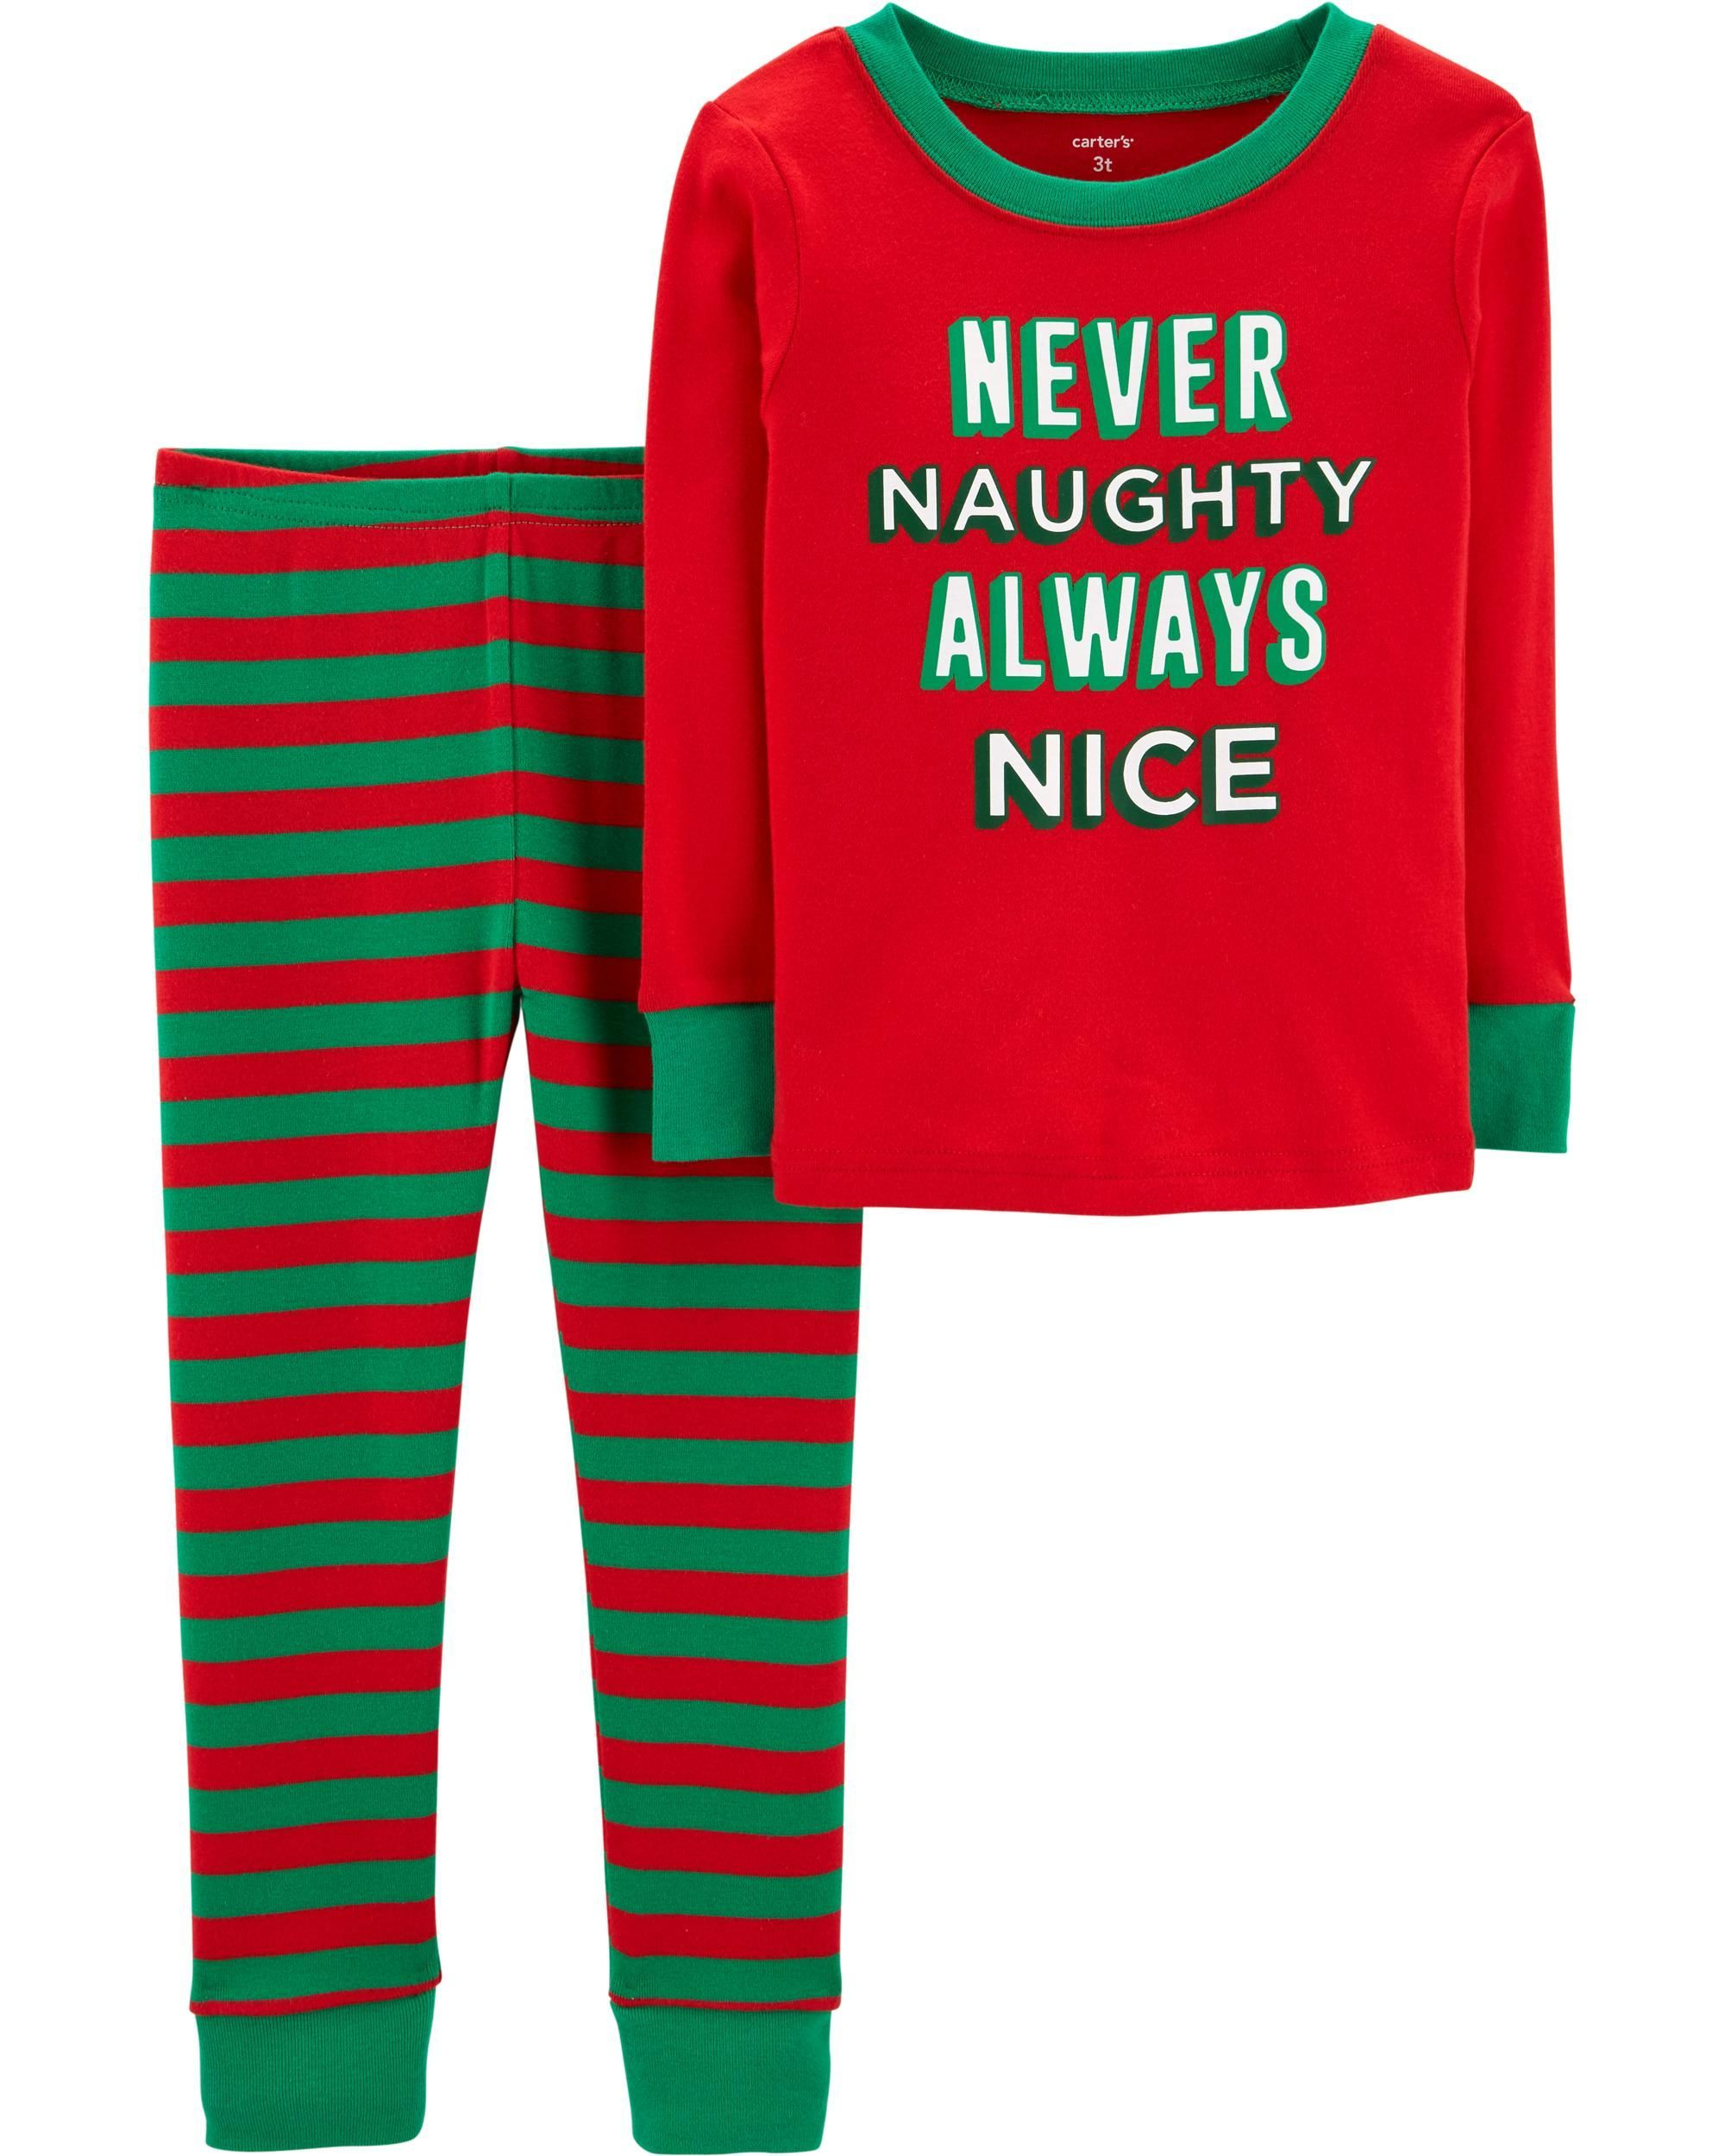 83a48ff0f2 Toddler Boy 2-Piece Toddler Christmas Snug Fit Cotton PJs